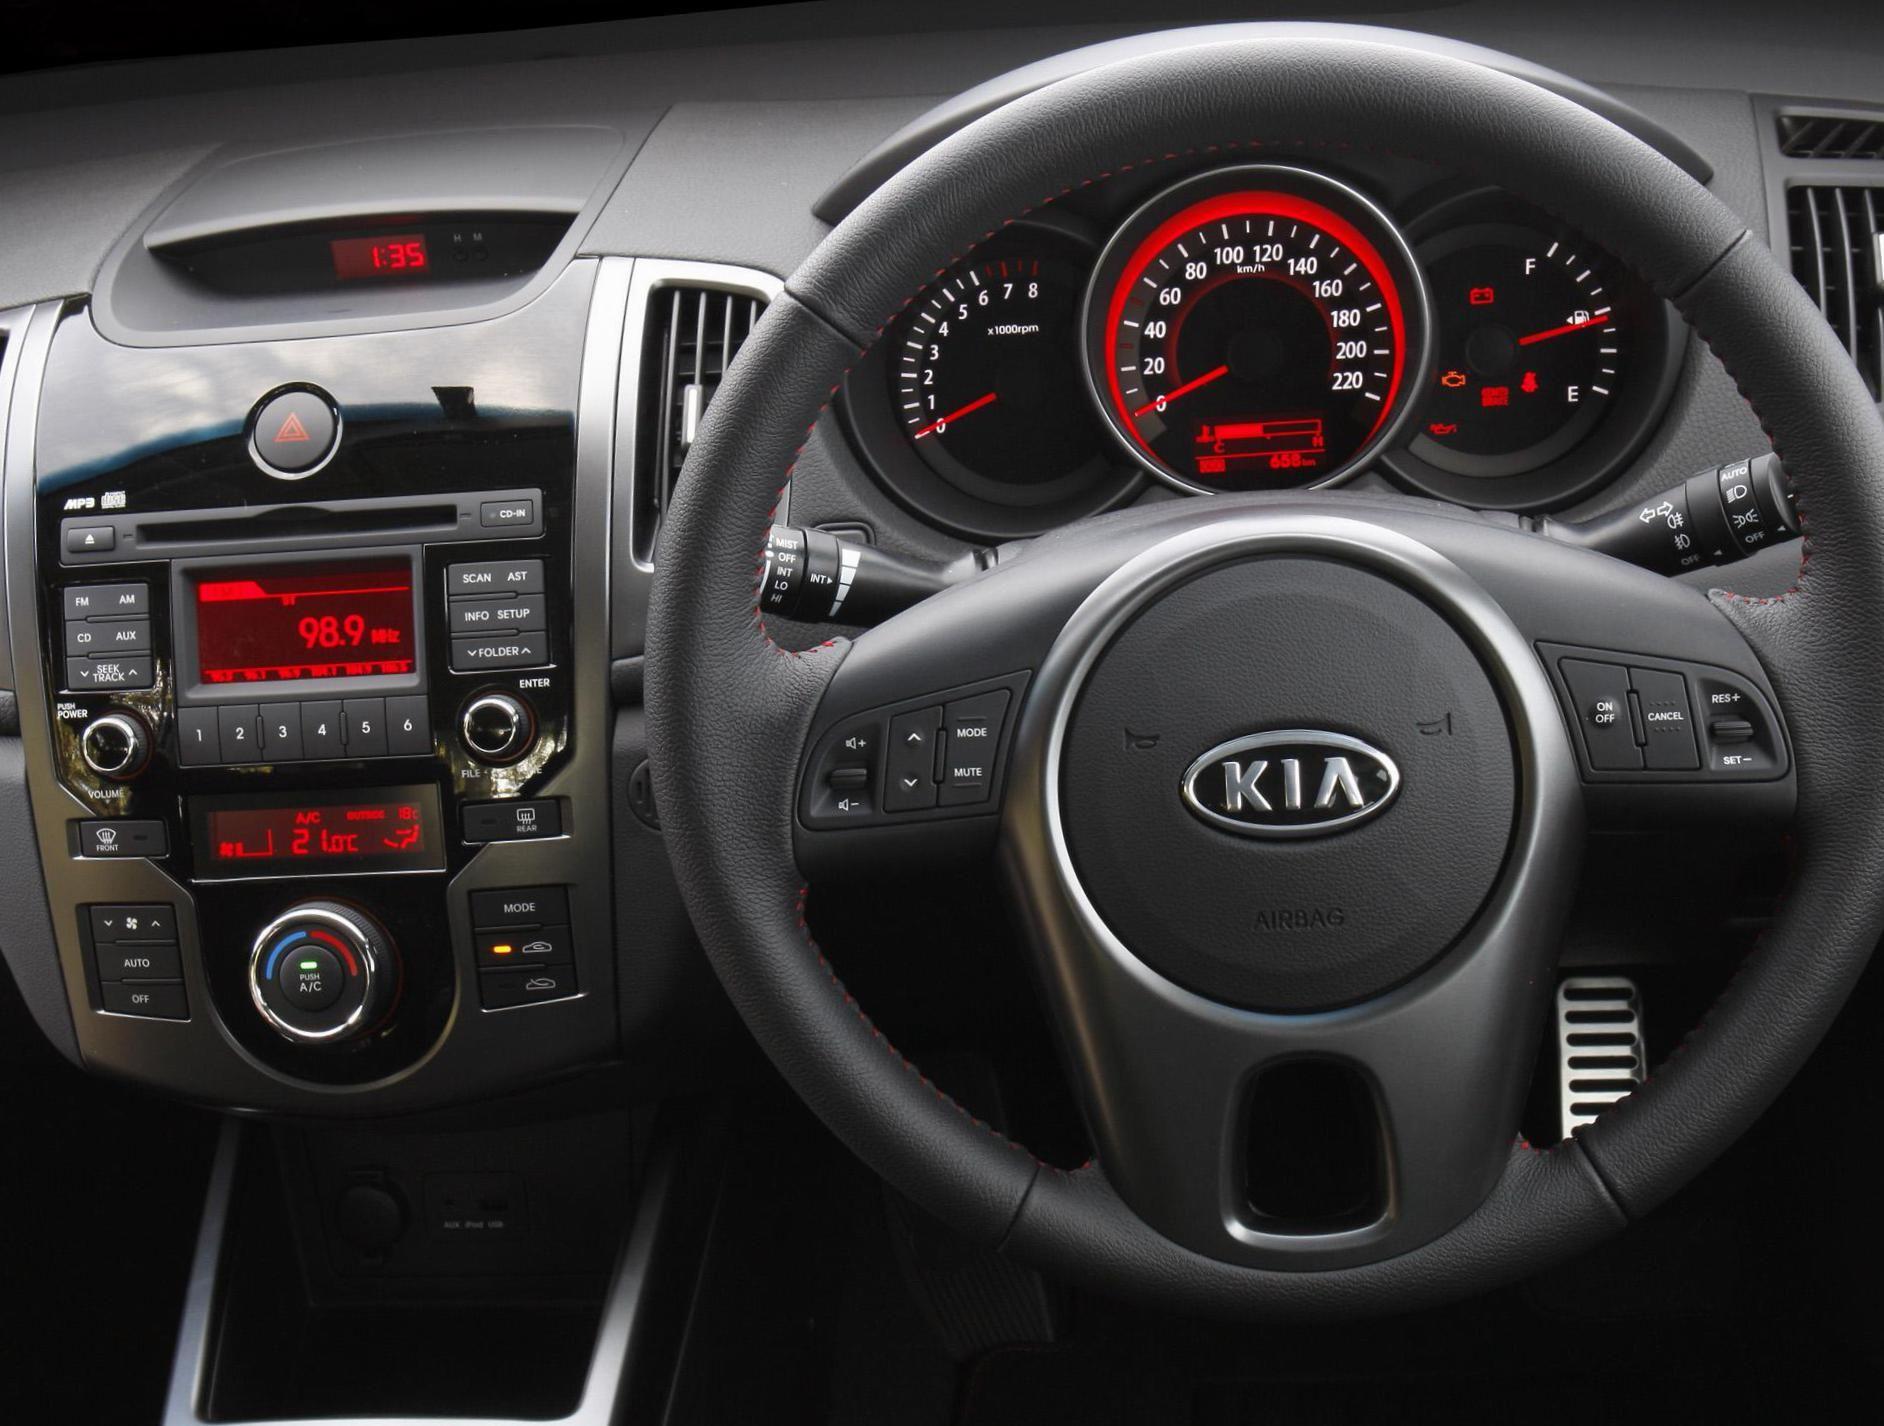 Kia Cerato Koup Reviews Http Autotras Com Kia Dream Cars Photo